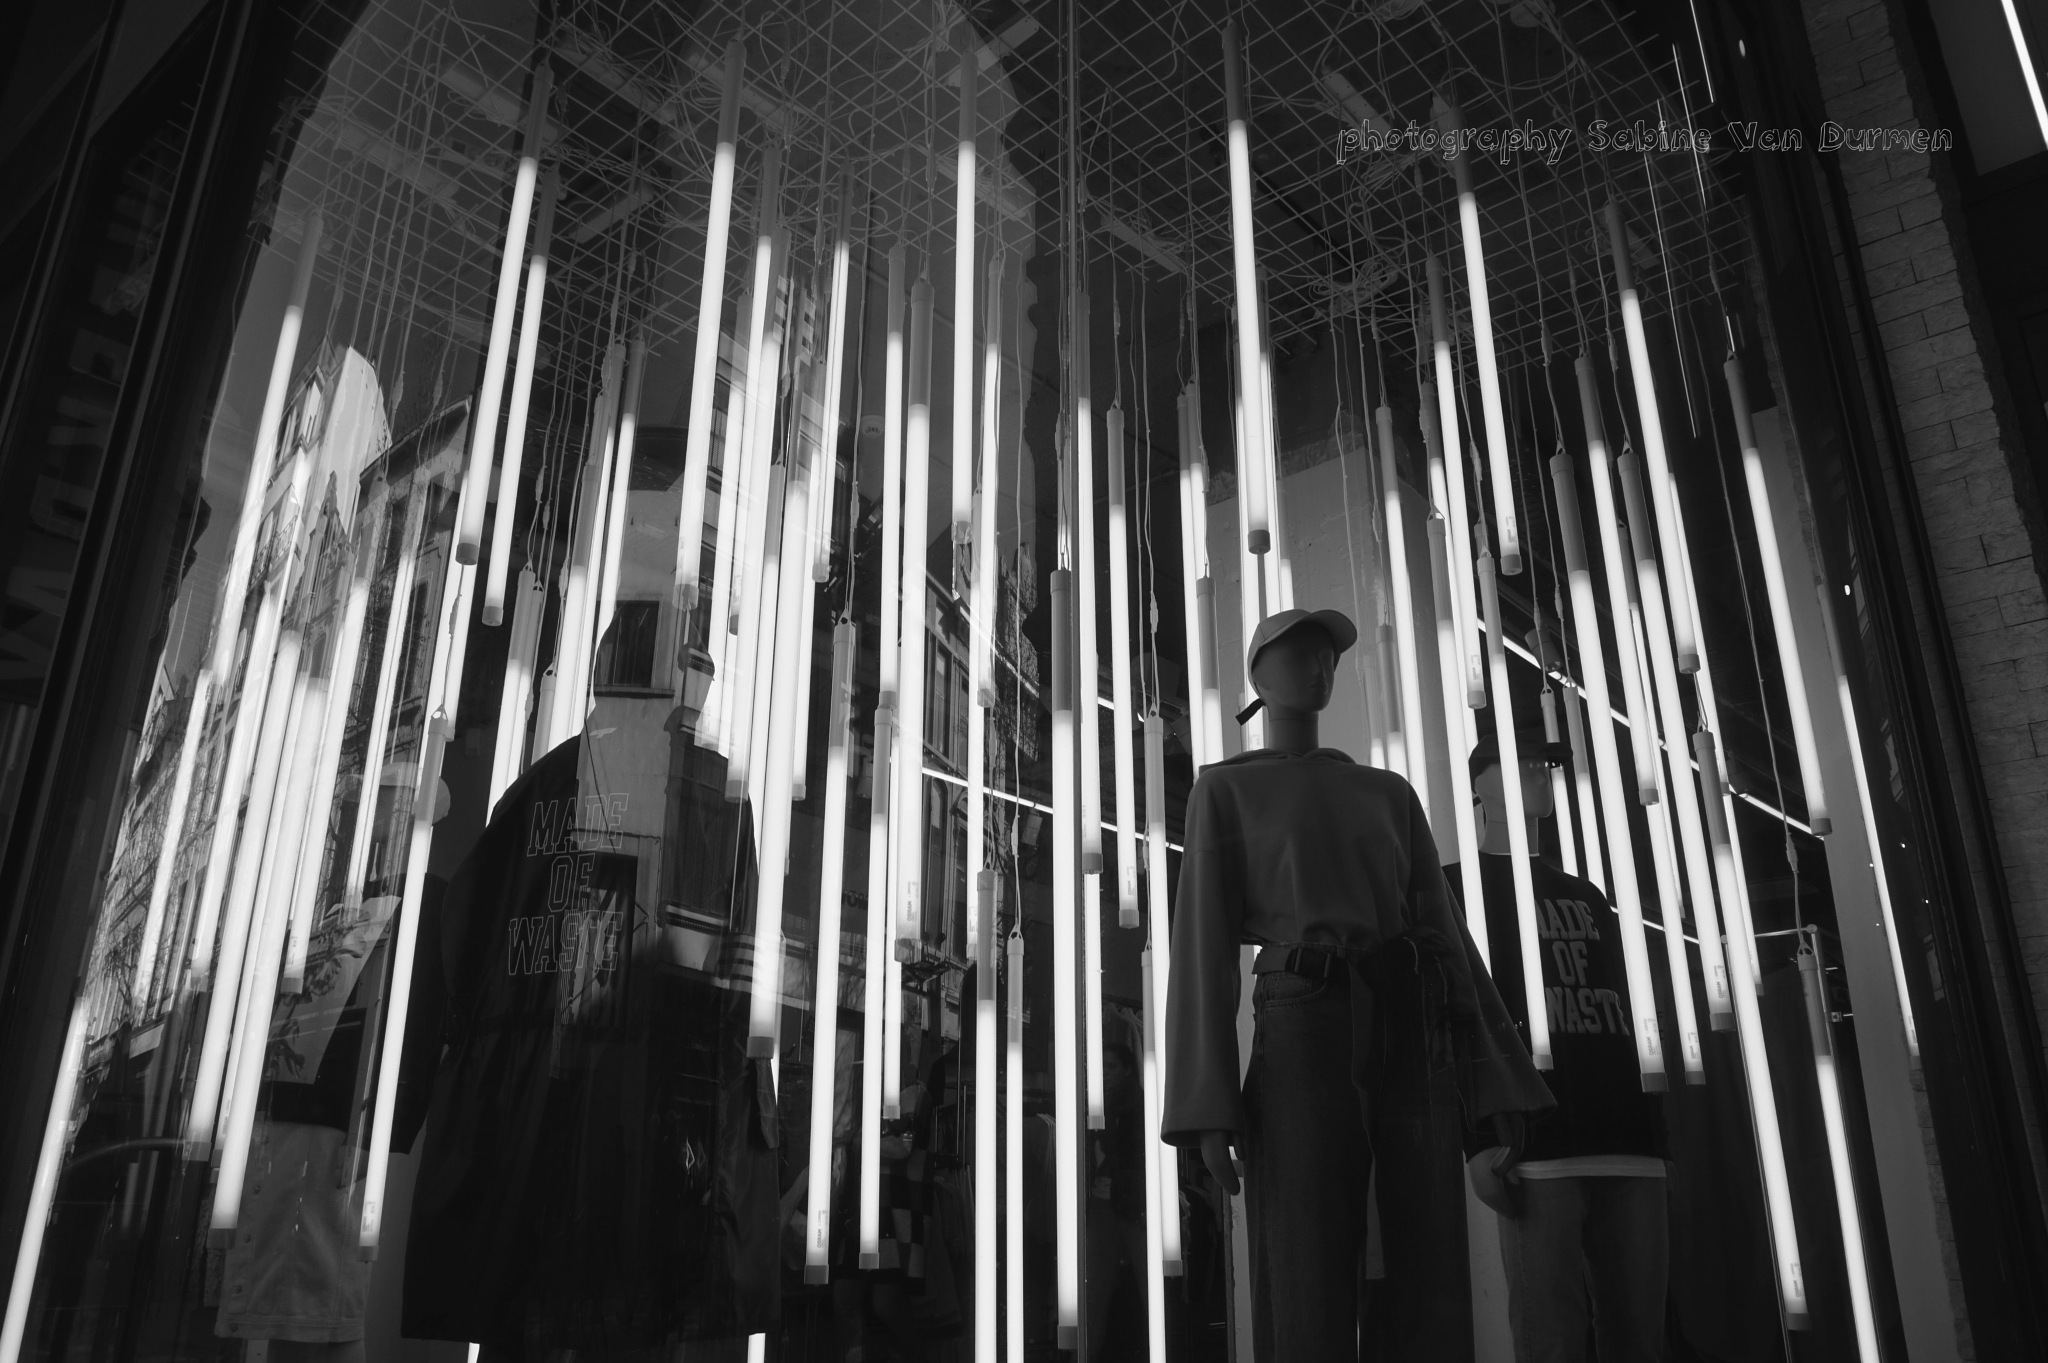 lighting and lines by sabine.vandurmen